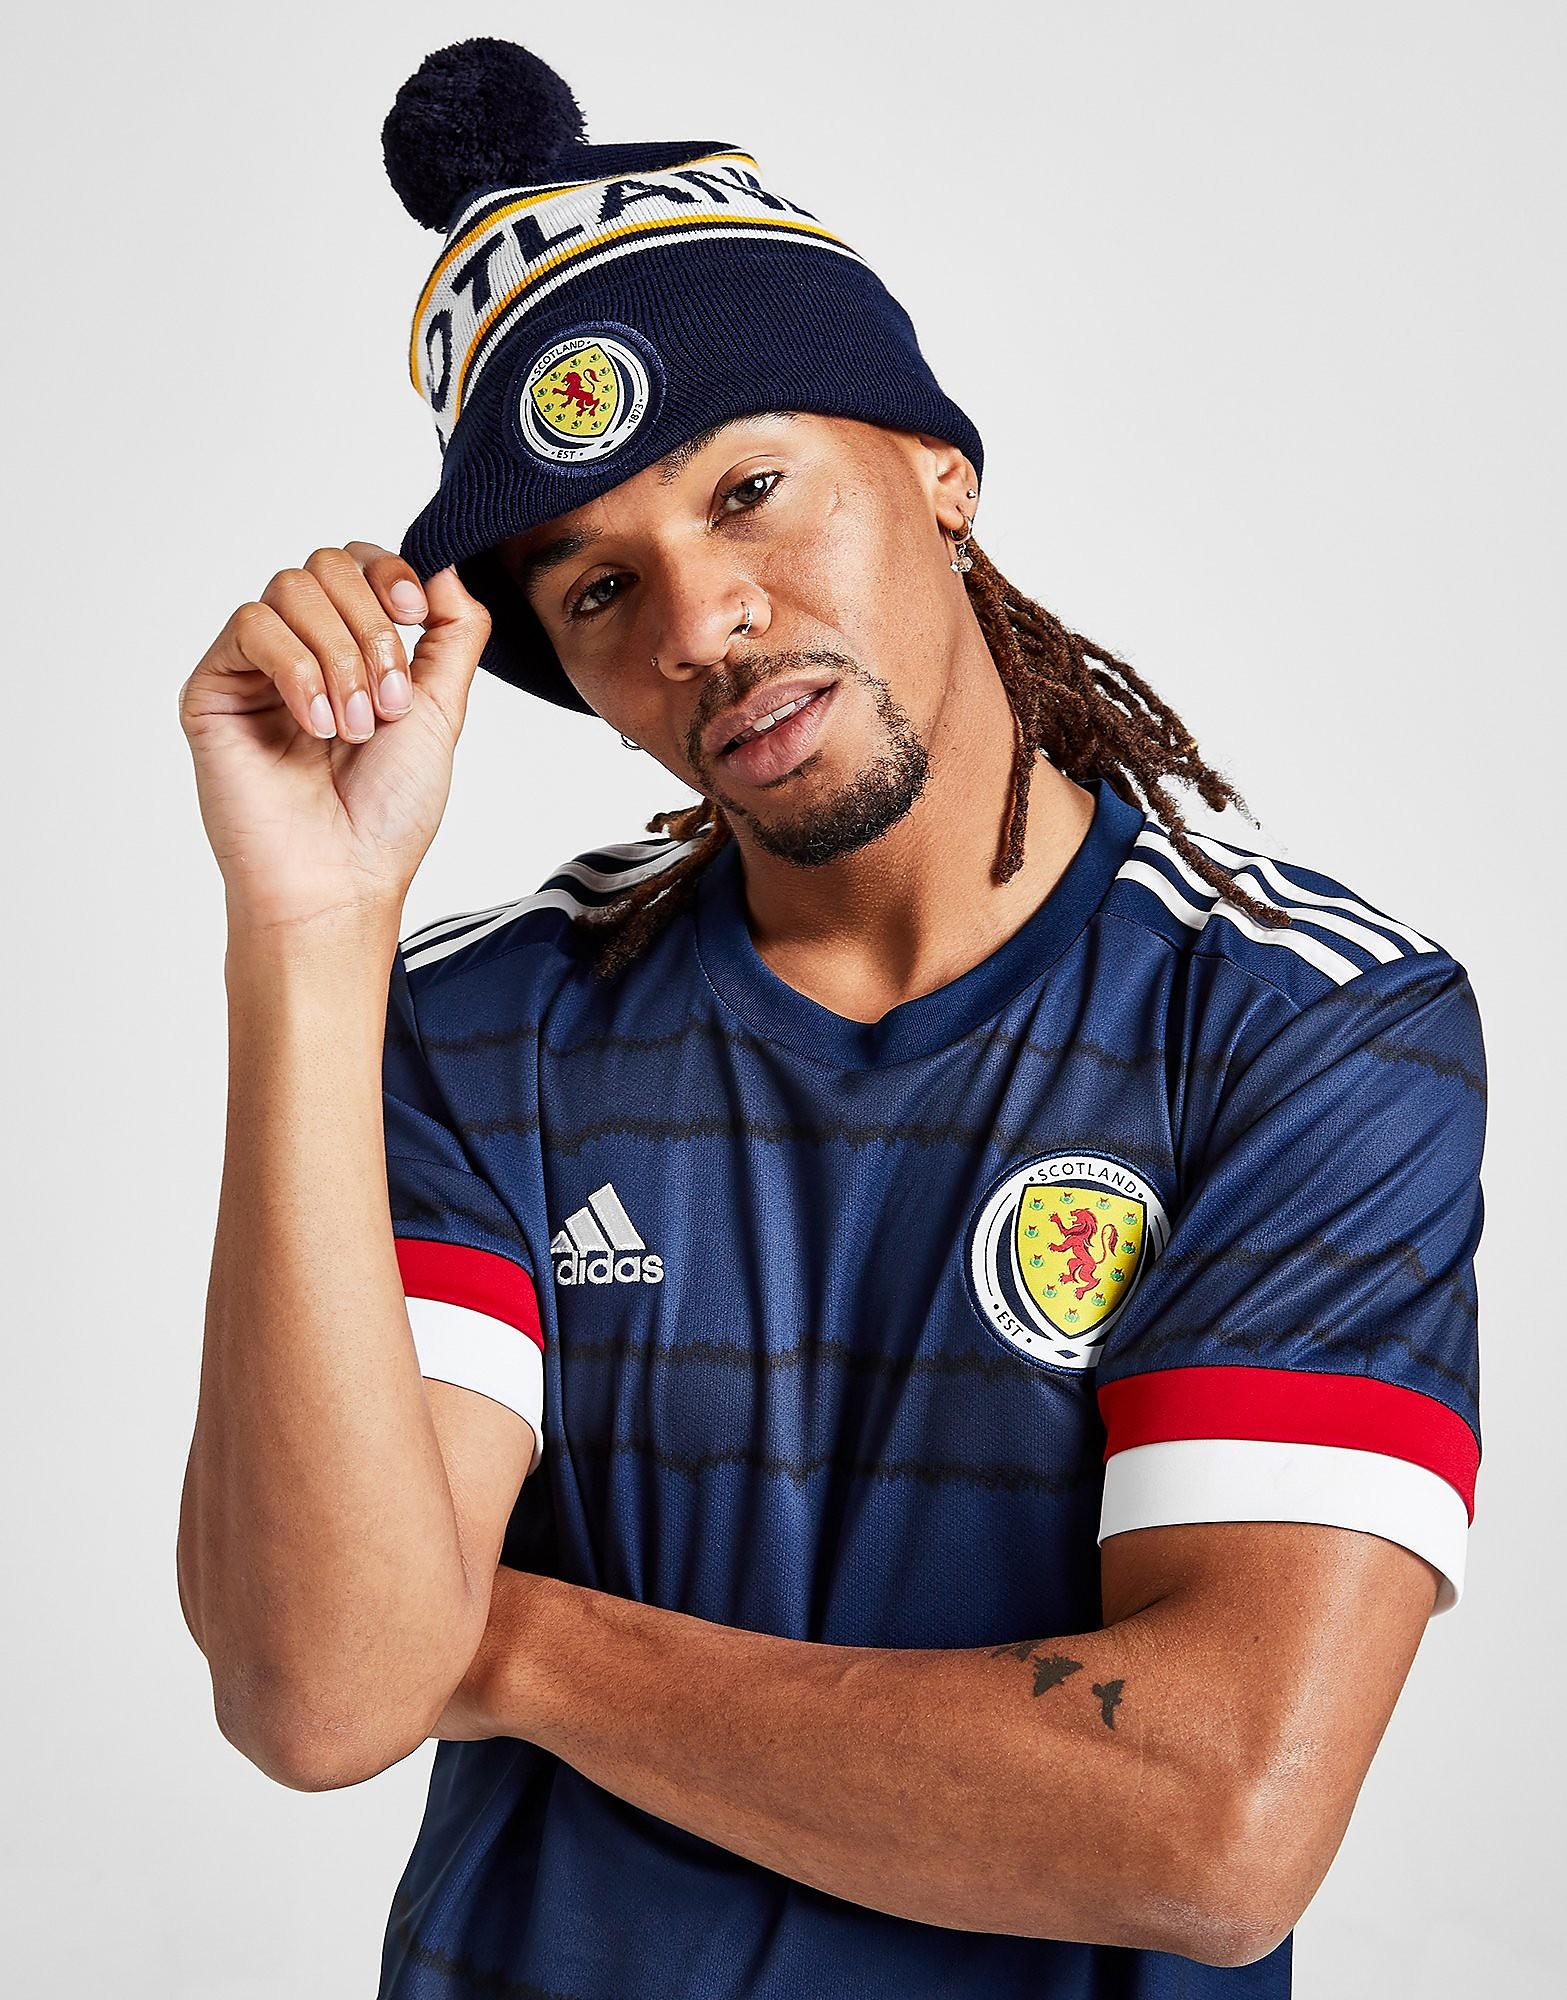 Official Team Schottland FA Strickpudelmütze mit Schriftzug